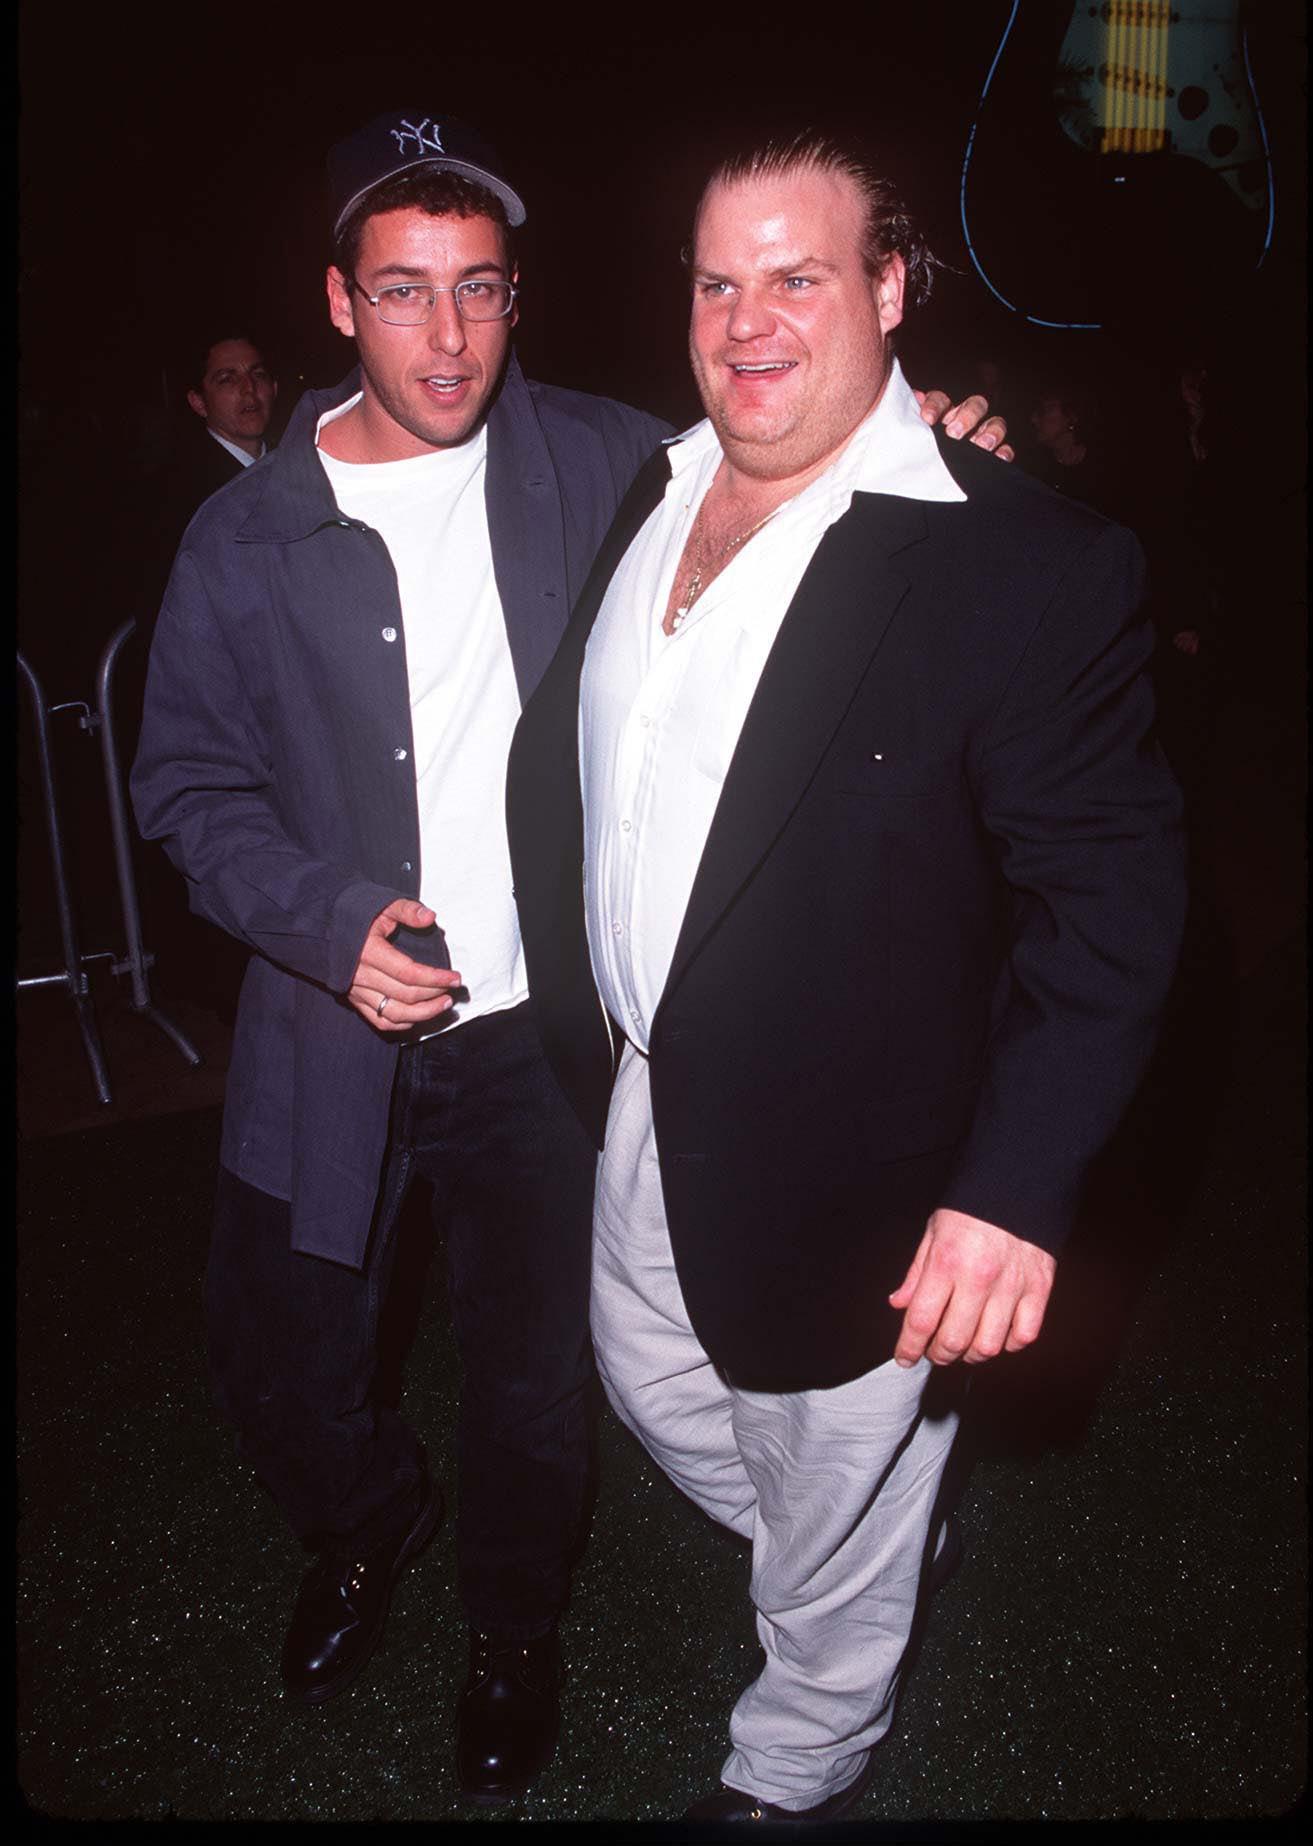 Adam Sandler & Chris Farley during